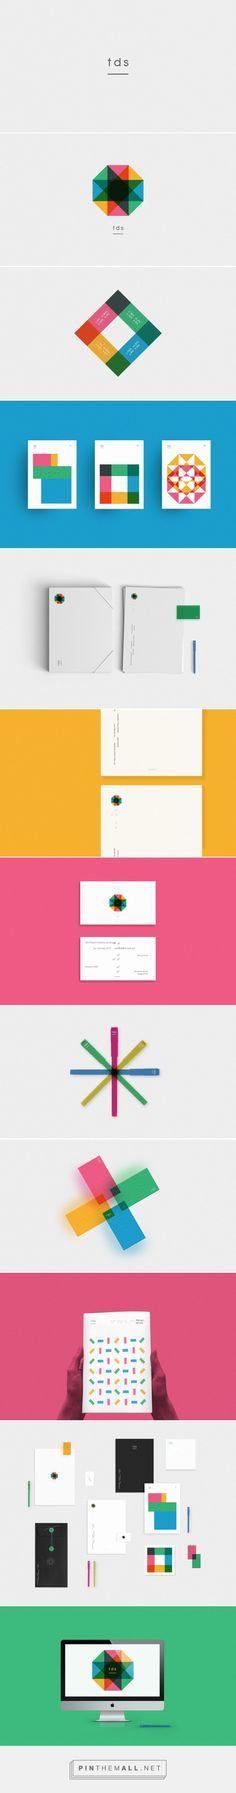 TDS. Braille Board Branding by Hachetresele Studio | Fivestar Branding – Design and Branding Agency & Inspiration Gallery - created via https://pinthemall.net